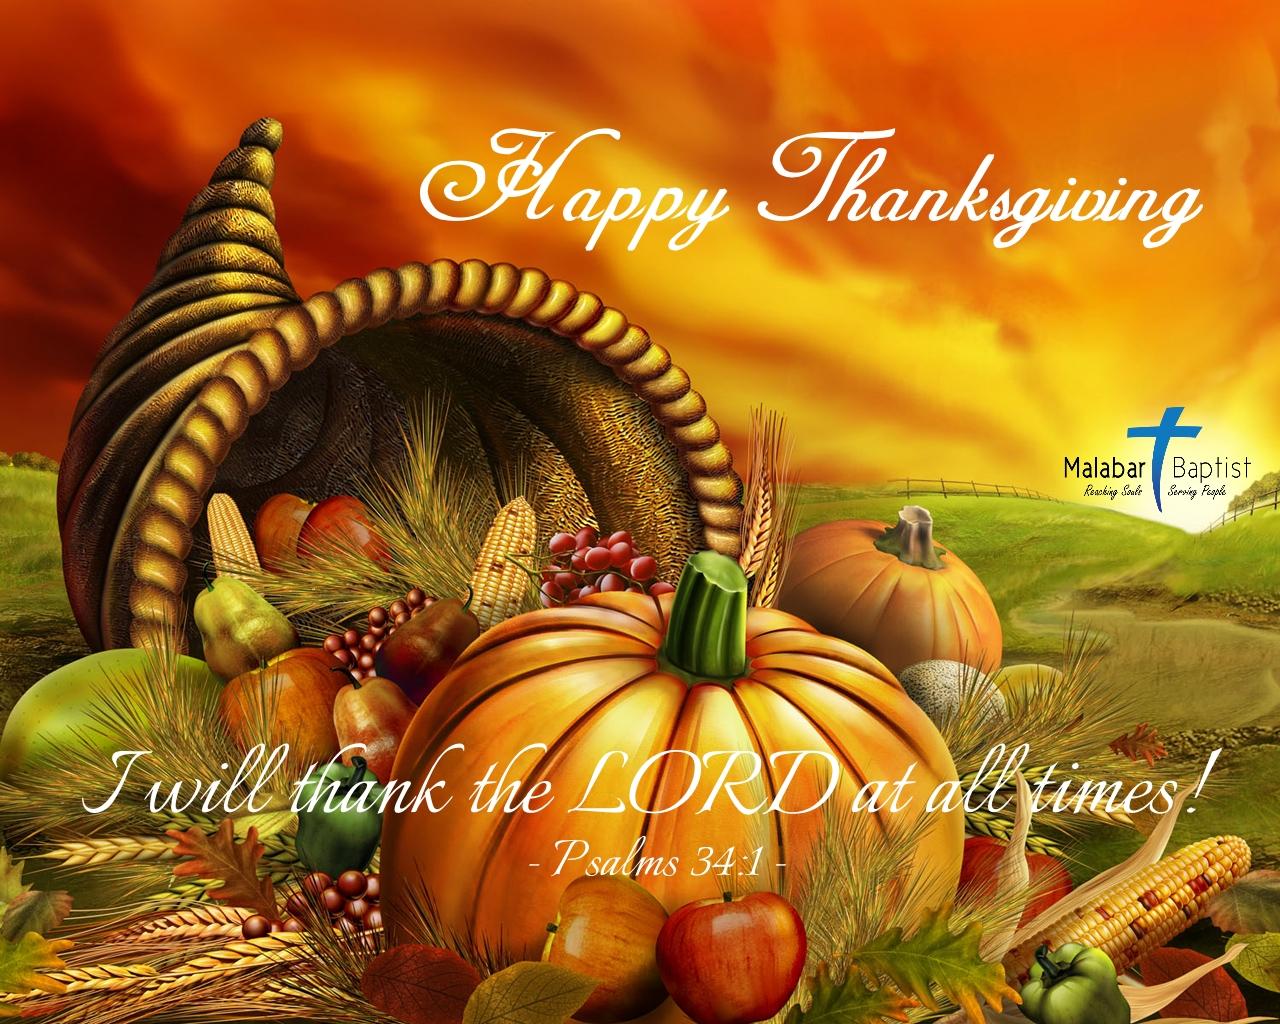 http://malabarbaptist.com/wp-content/uploads/2018/11/FBCoM-Happy-Thanksgiving.jpg